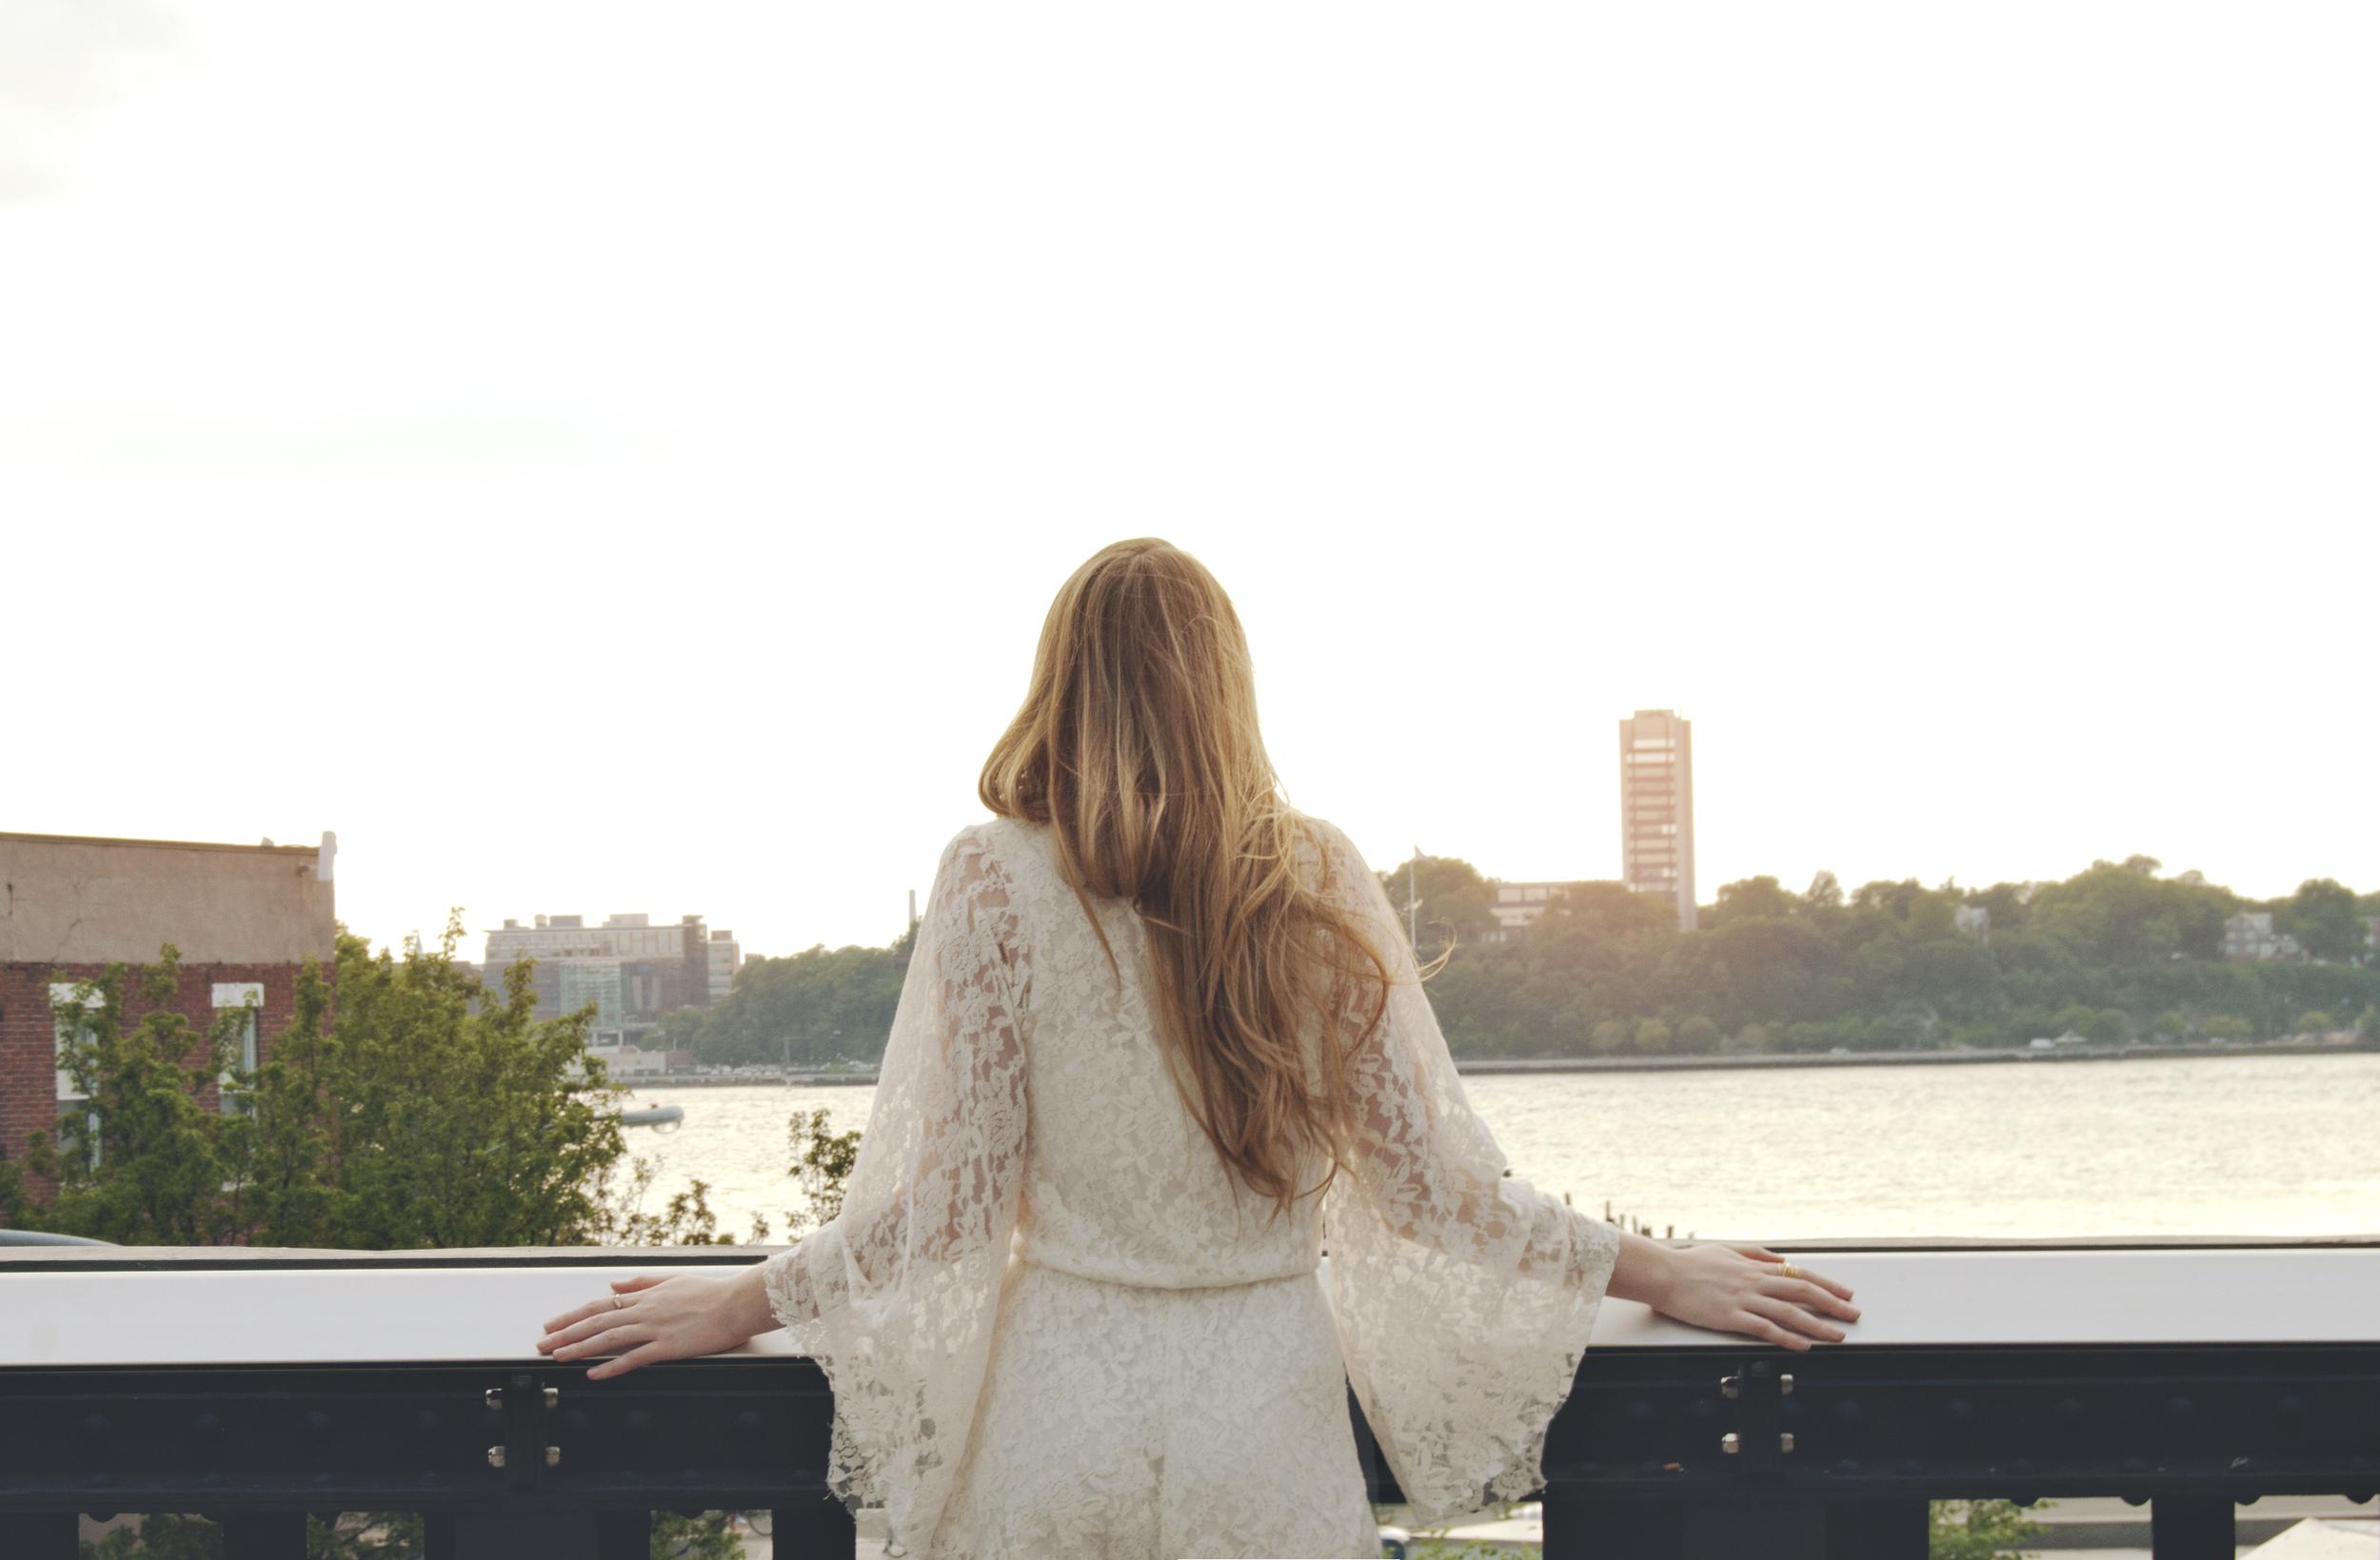 White Lace Romper (via Girl x Garment)